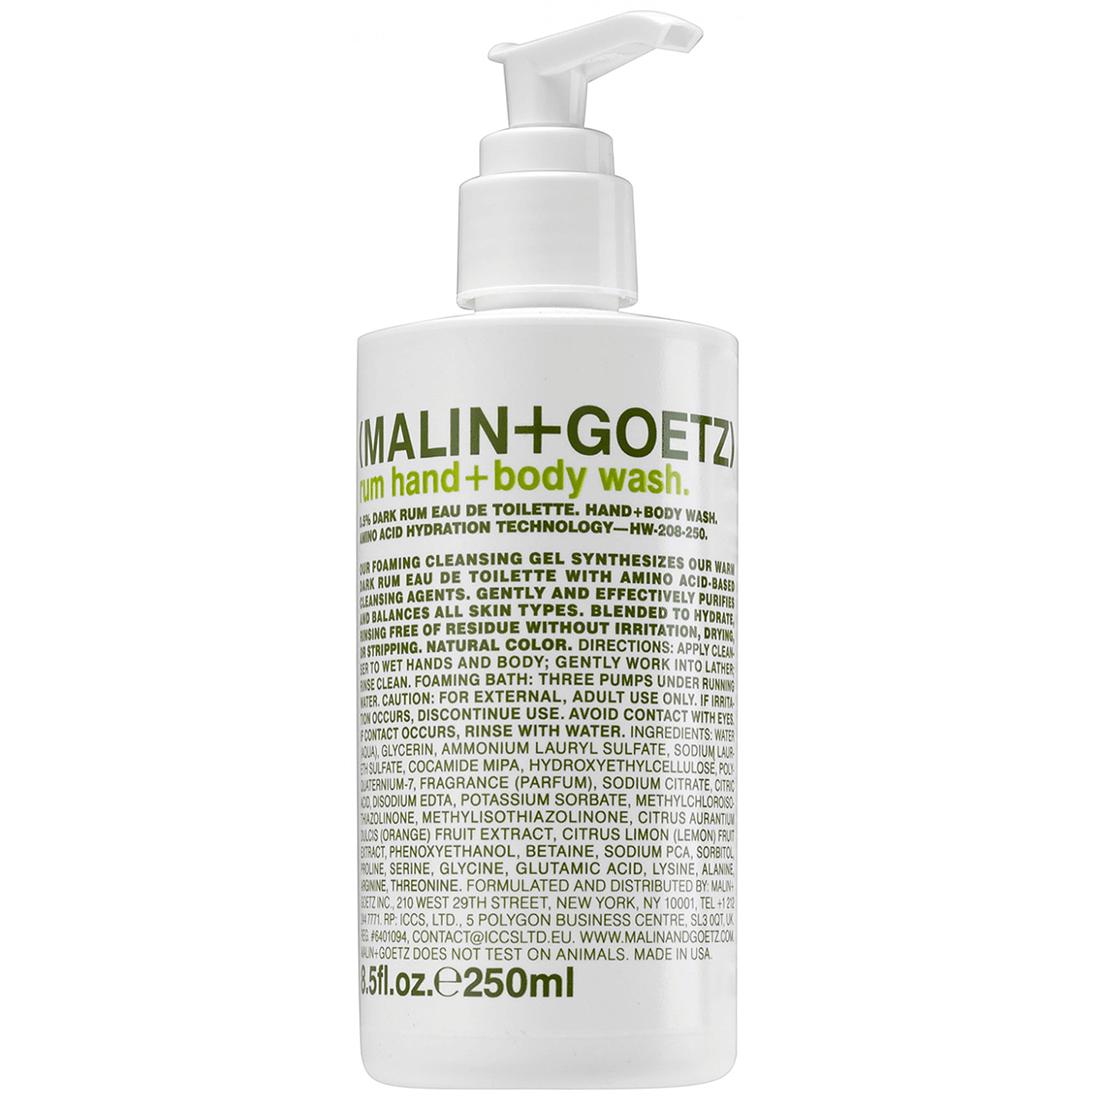 Men's Shower Gel - Malin+Goetz